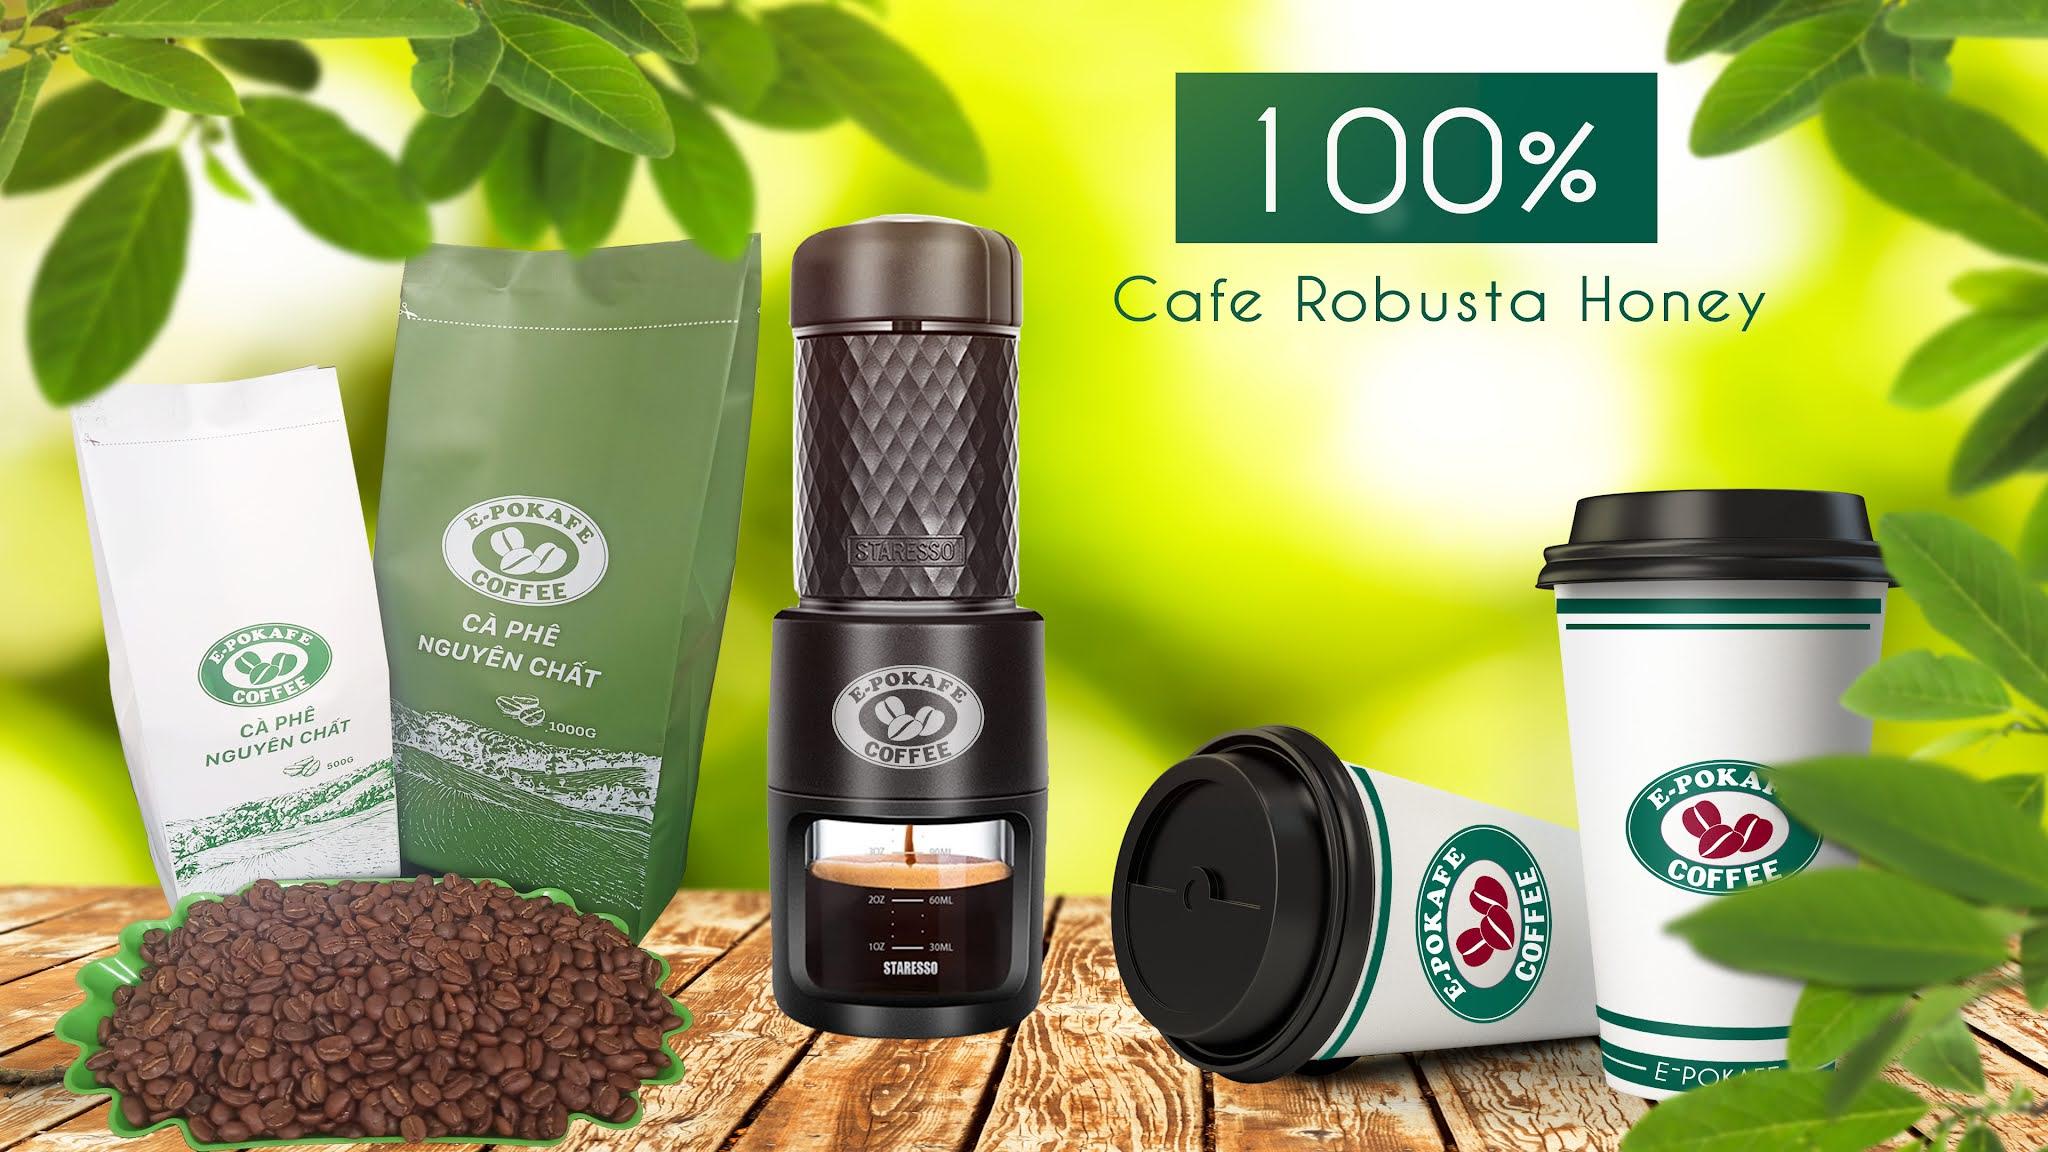 Cafe rang xay ở HCM, cafe nguyên chất ở HCM, cafe pha máy ở HCM, cafe pha phin ở HCM, cafe mang đi, Cafe chất lượng cao, Cafe ngon, cafe take away,